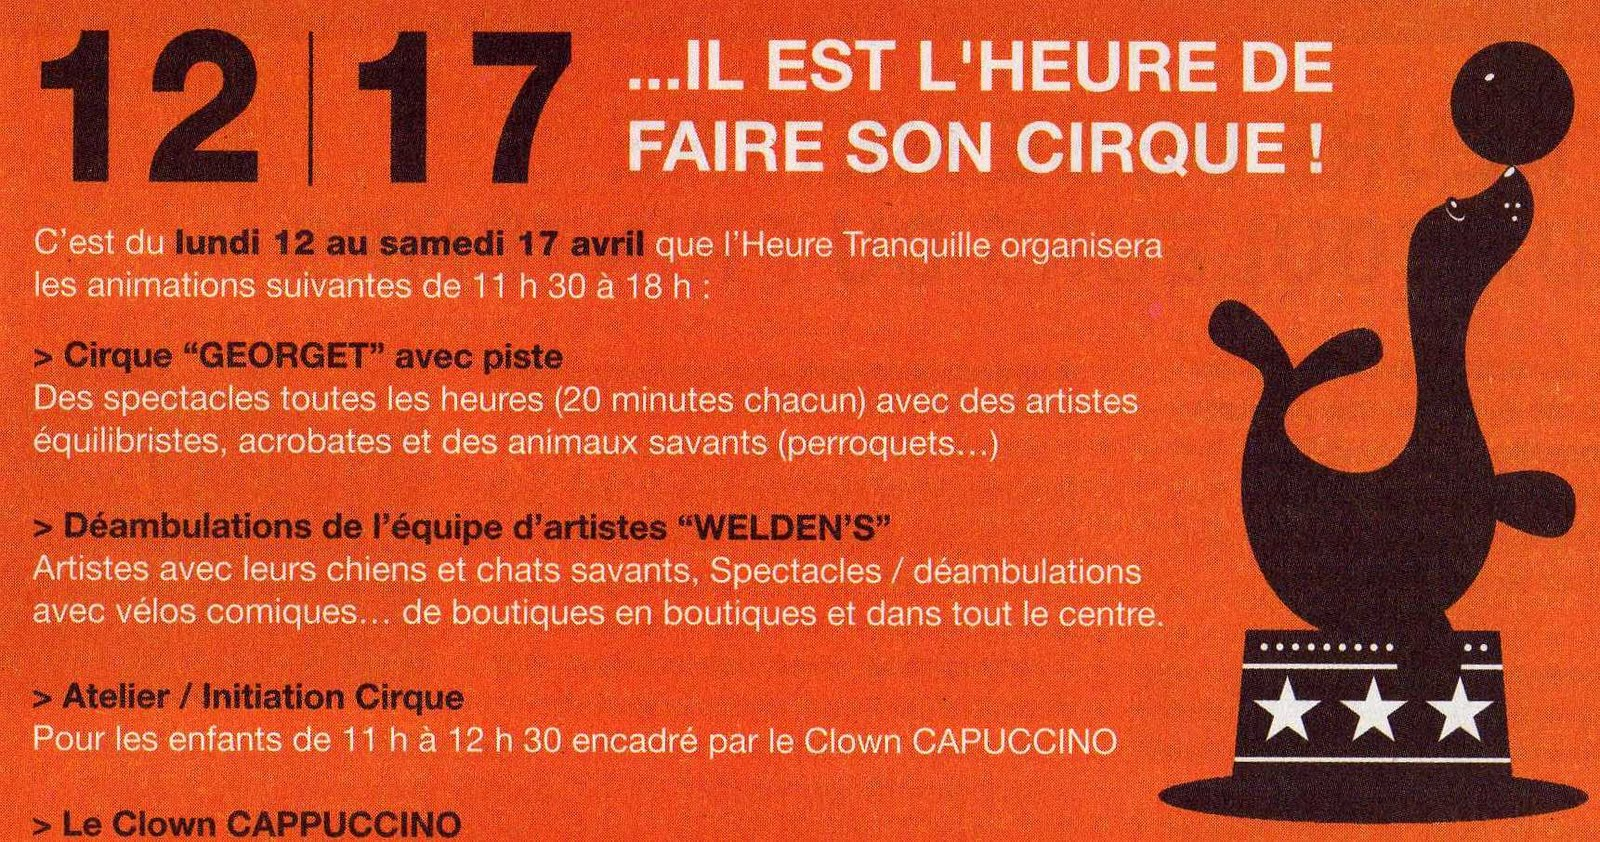 burguscircus semaine du cirque a l heure tranquille a tours